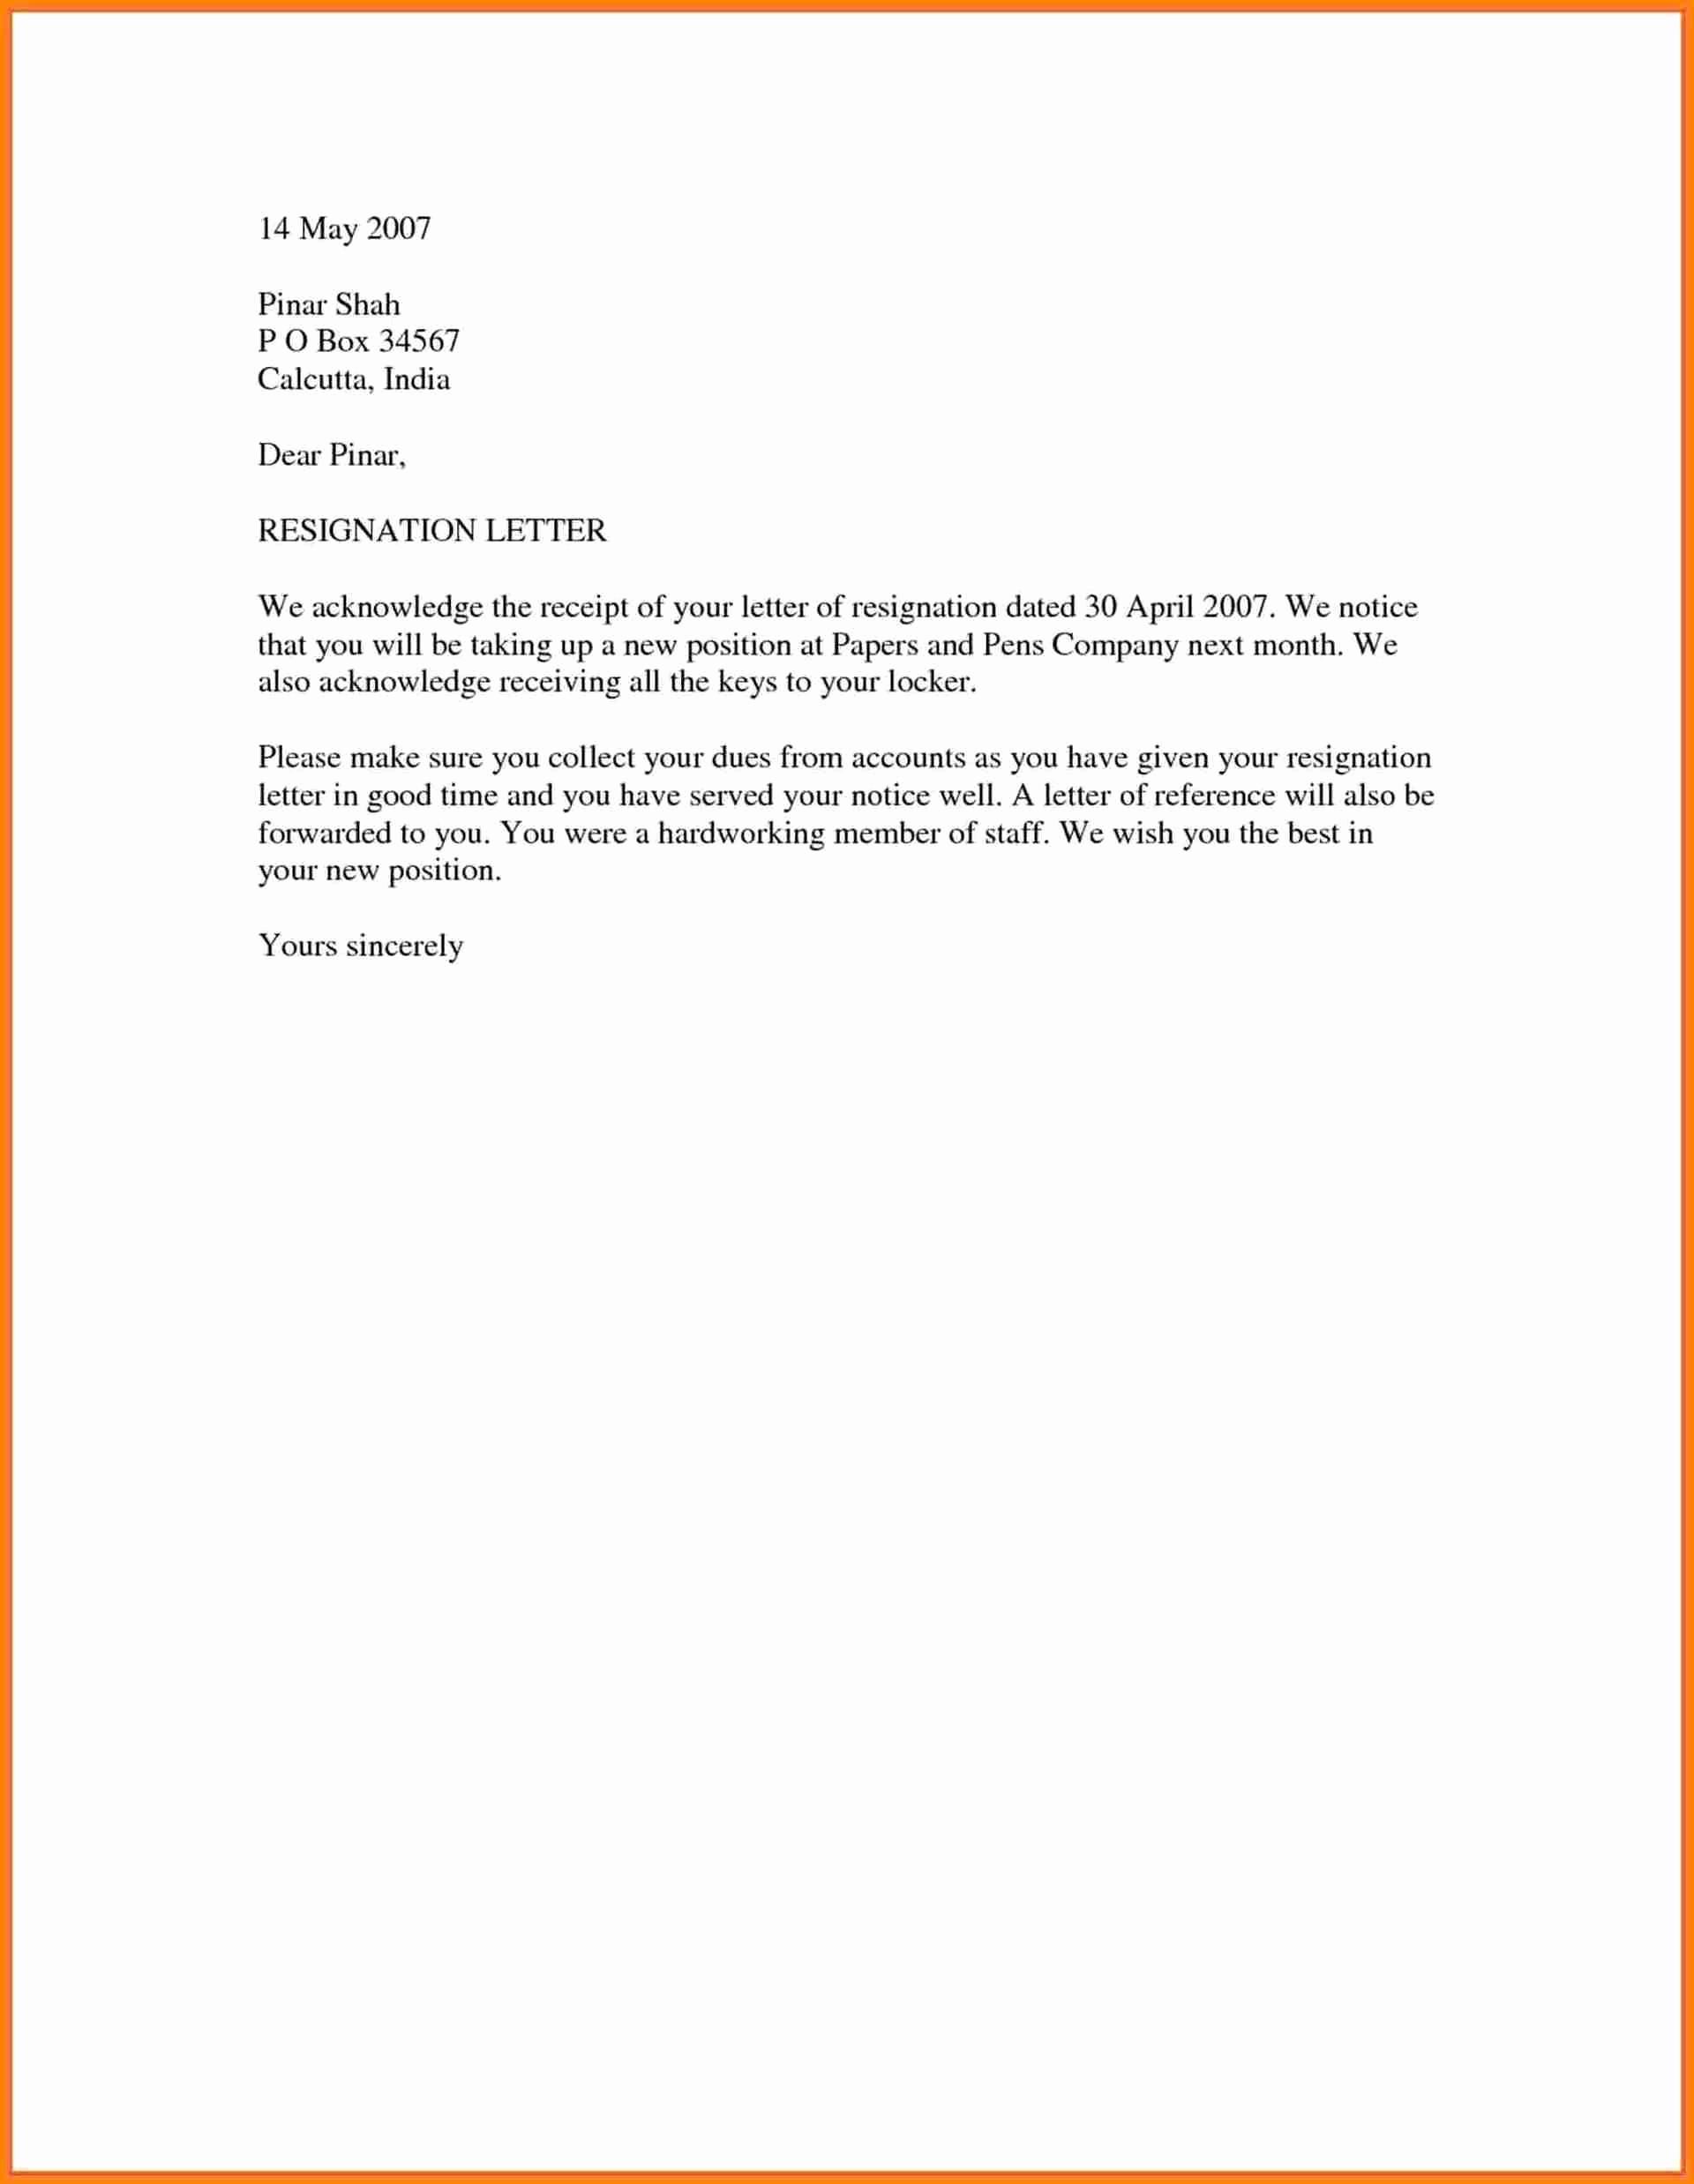 Resignation Letter Template Word Doc Unique 18 Simple Resignation Letter Sample